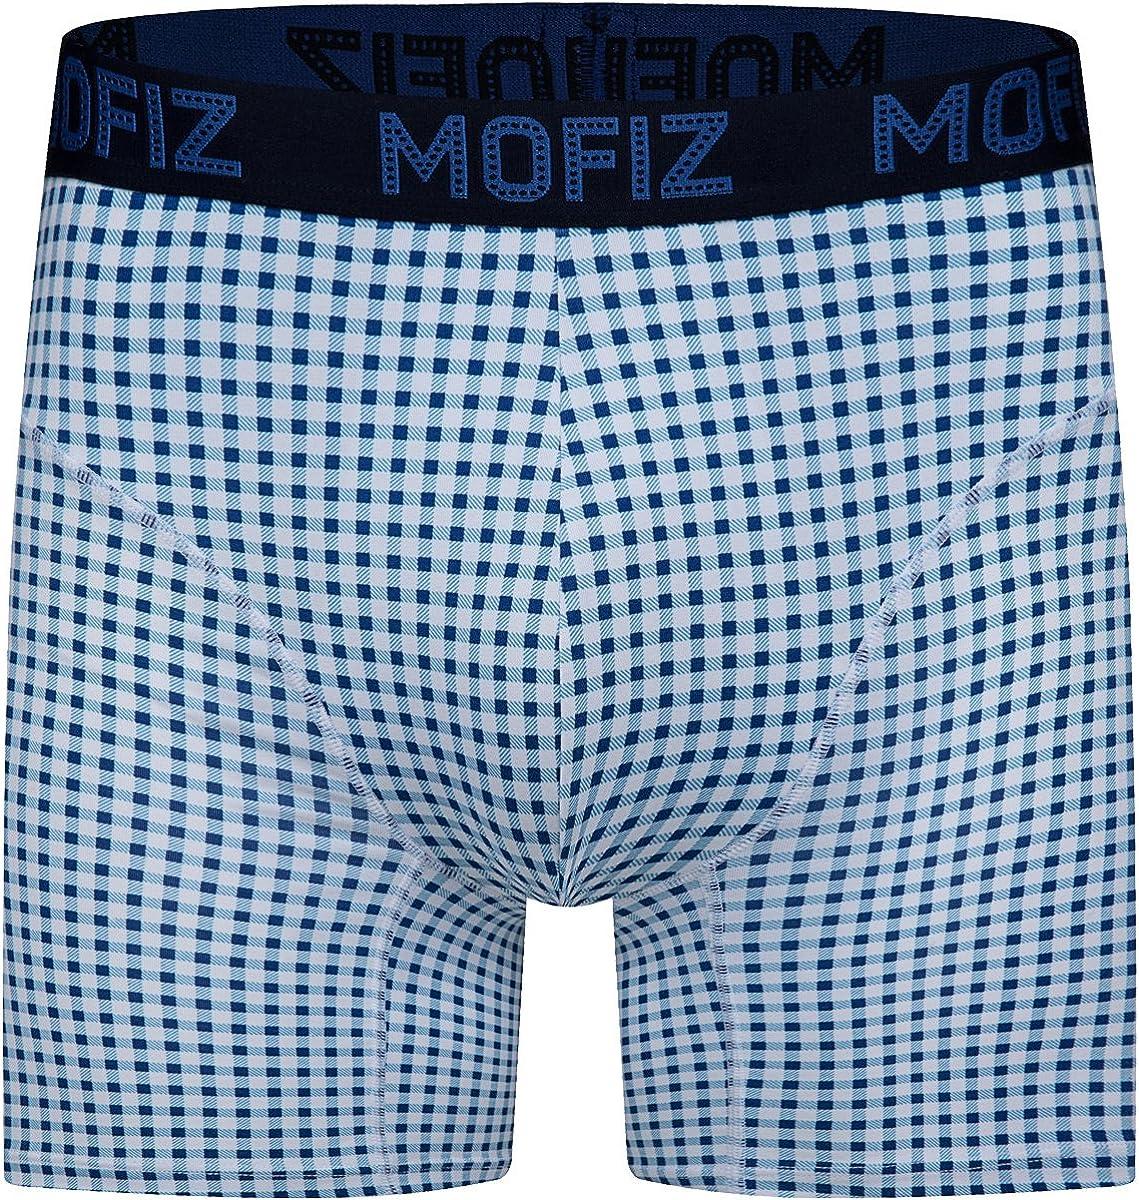 MoFiz Men/'s Stretch Boxer Briefs Short Leg Comfy Cotton Underwear